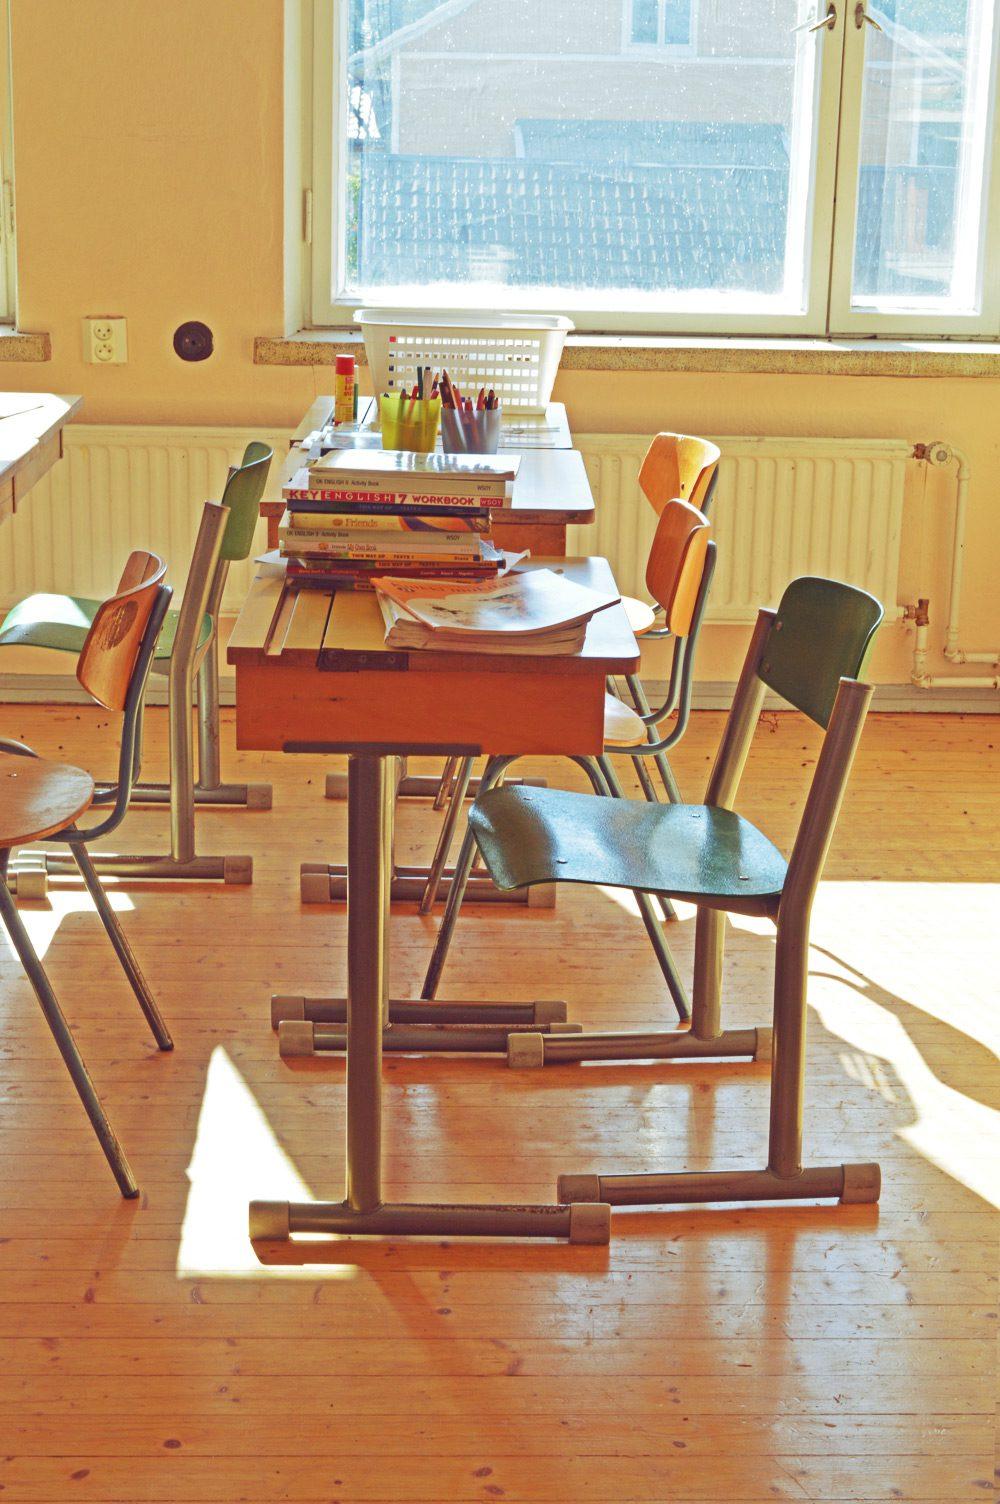 Skolbacka abandoned classroom